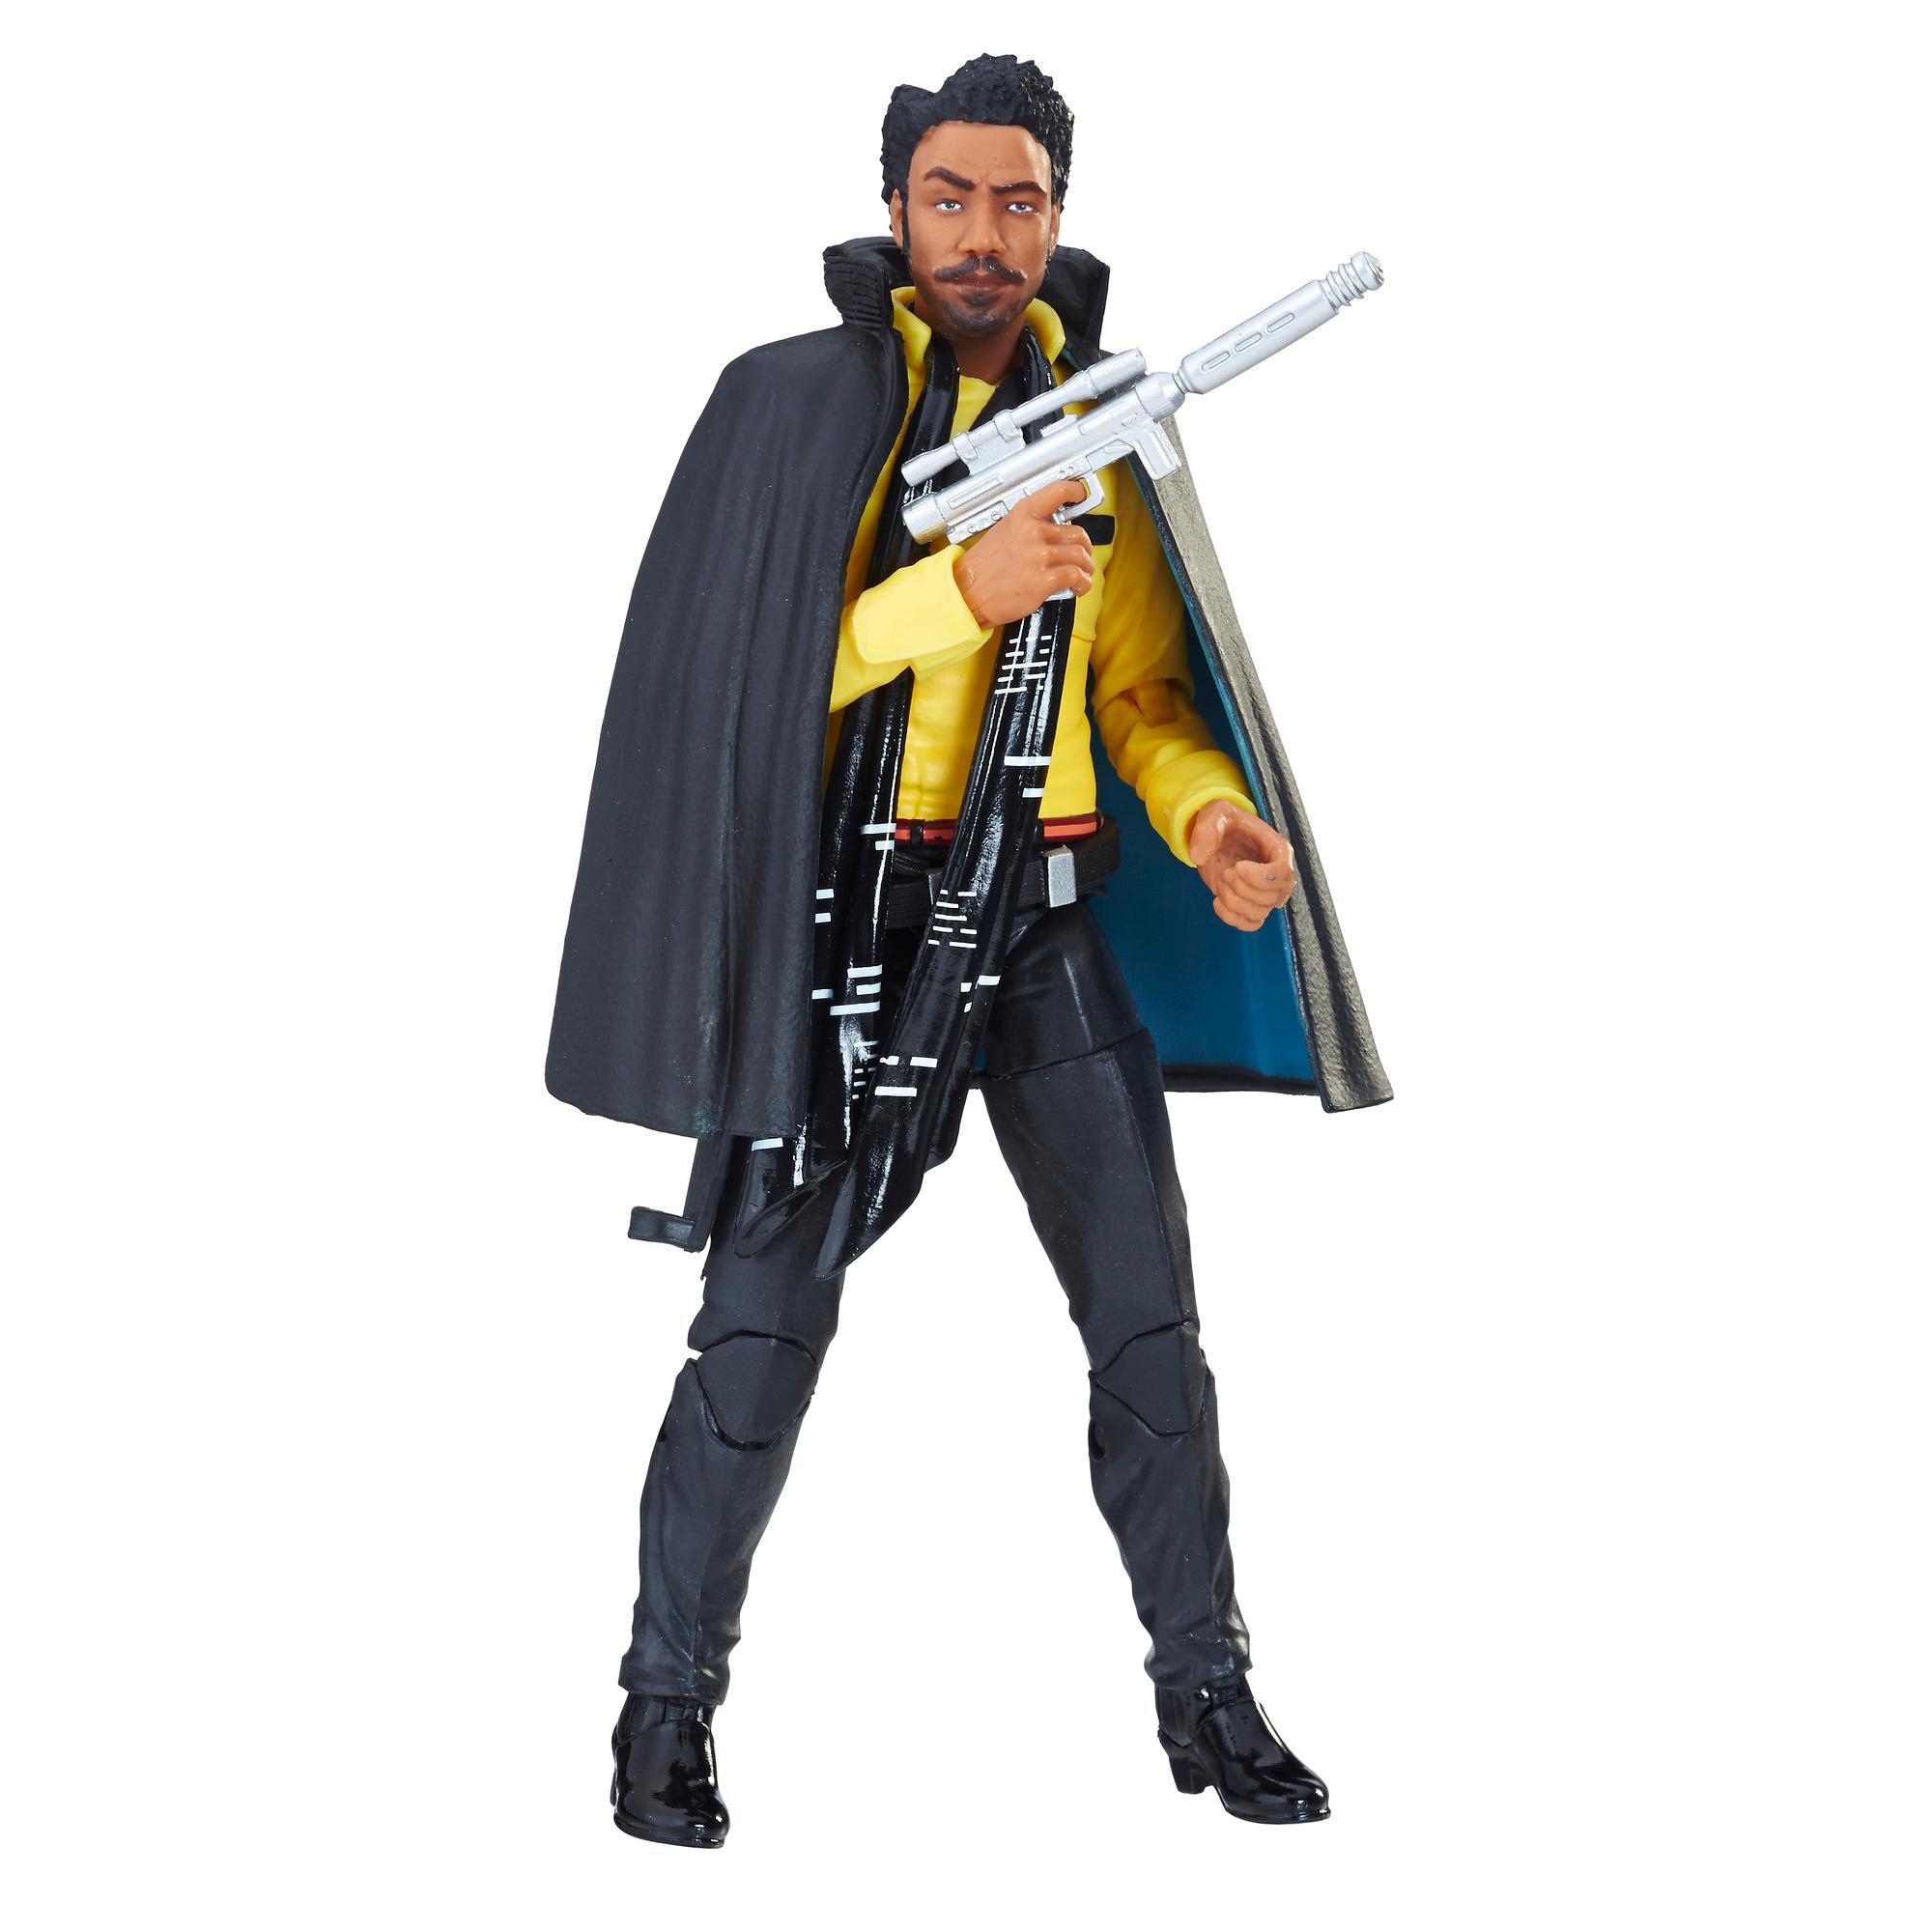 Star Wars Série noire - Figurine Lando Calrissian de 15 cm